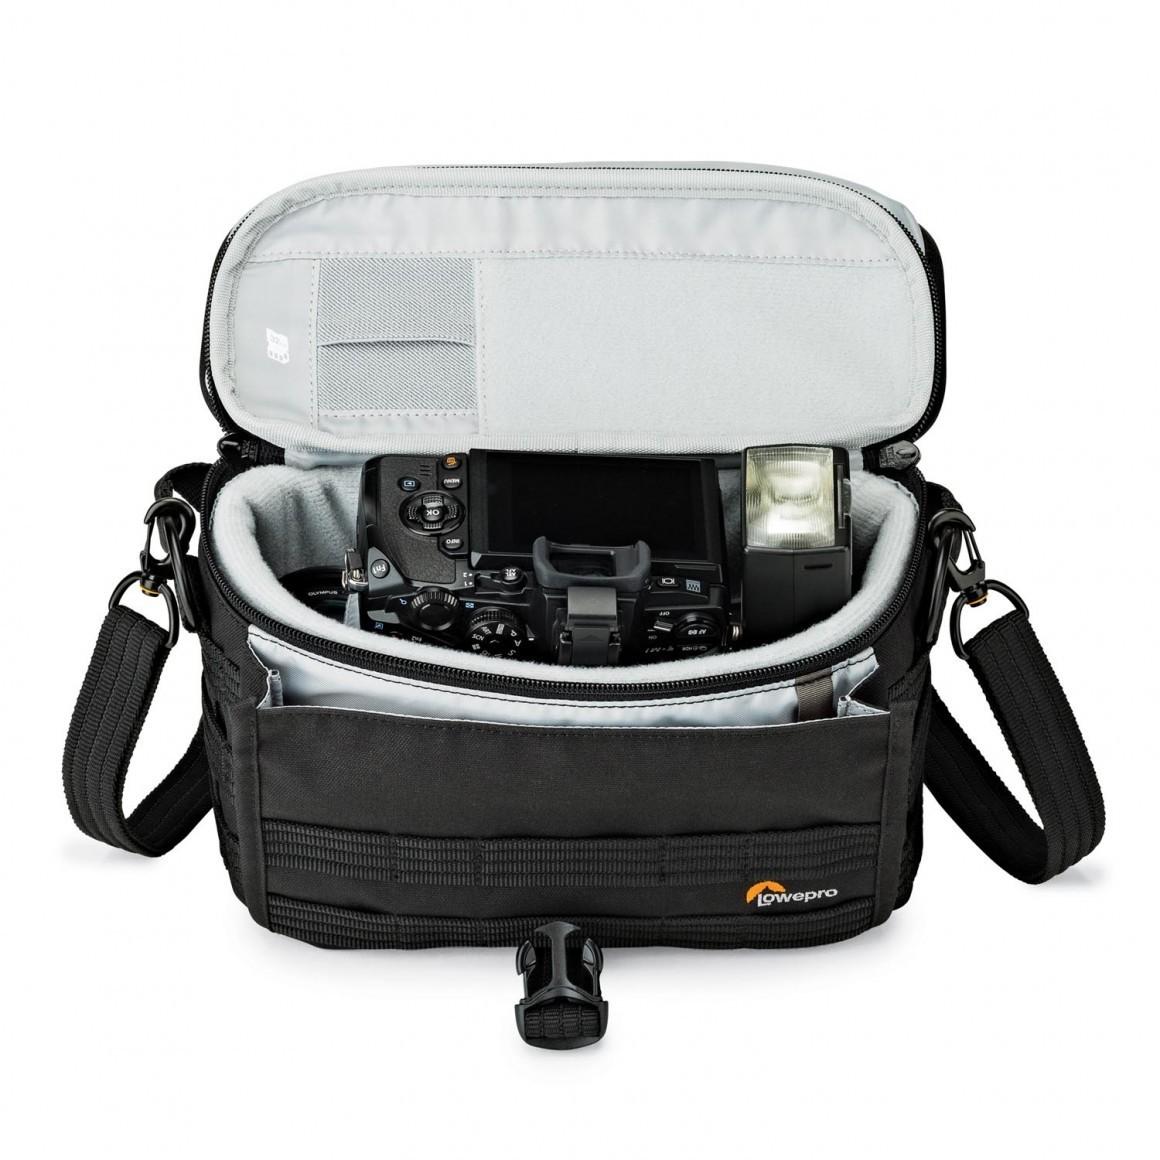 Lowepro Kameralaukku Protactic Aw Aw Sh120 Kameralaukku Protactic Sh120 Lowepro POZkXiTu